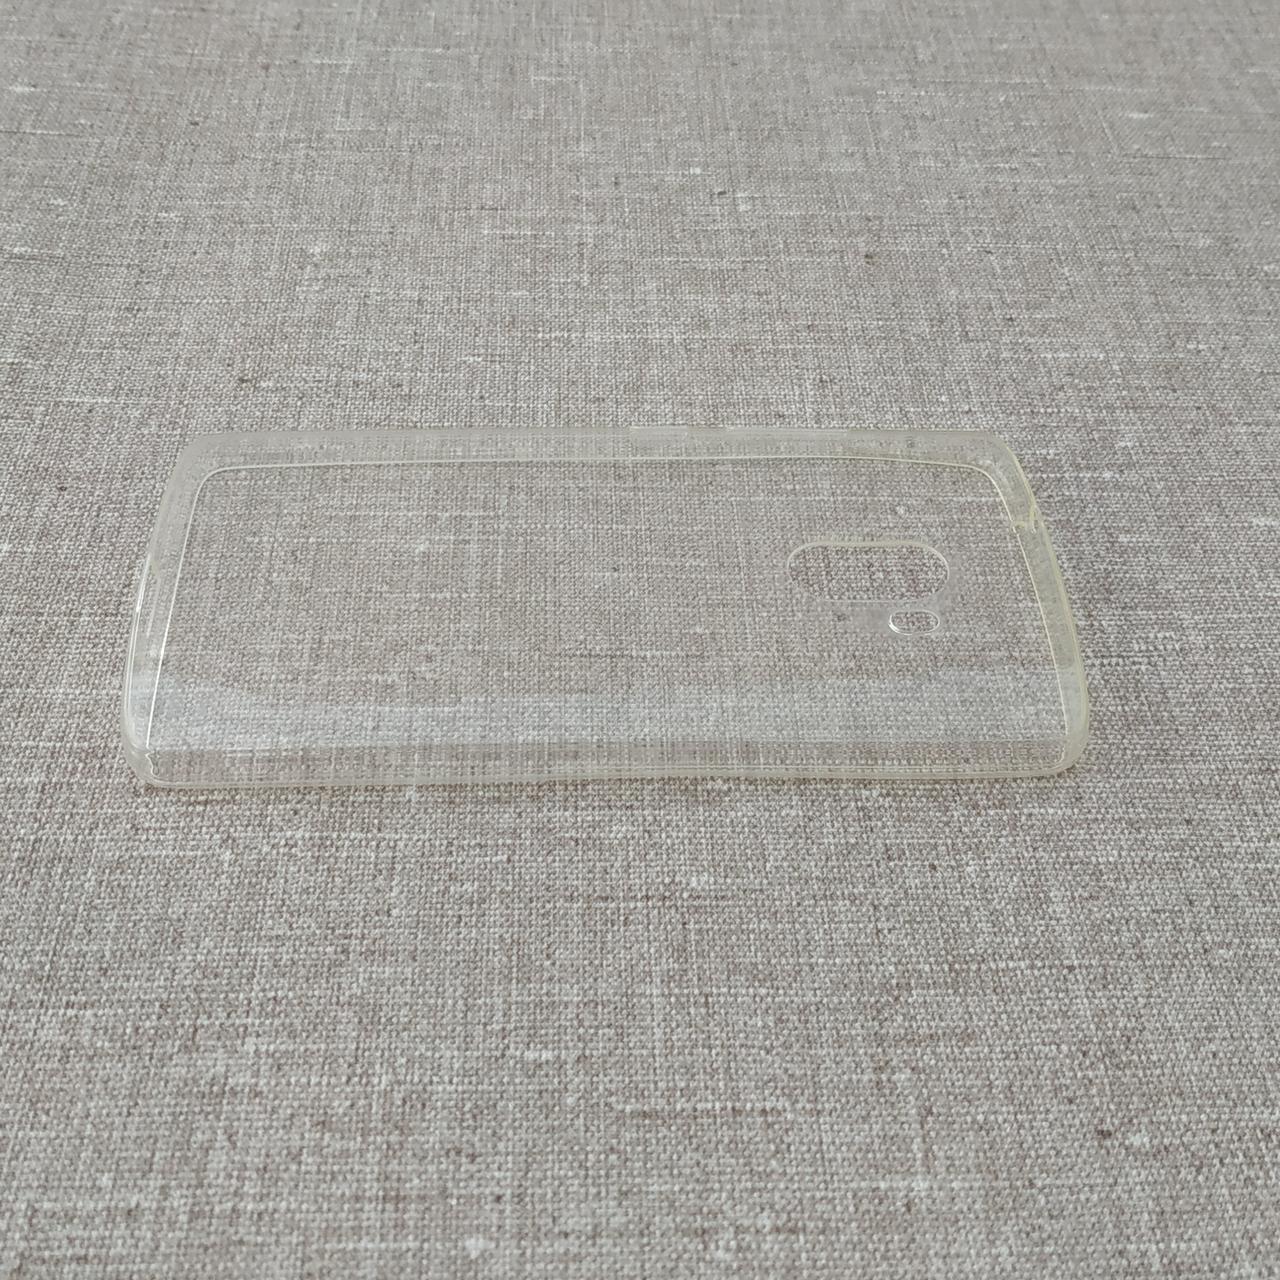 Чехлы для других смартфонов TPU Ultrathin 0.33mm Lenovo Vibe X3 soft-clear Для телефона